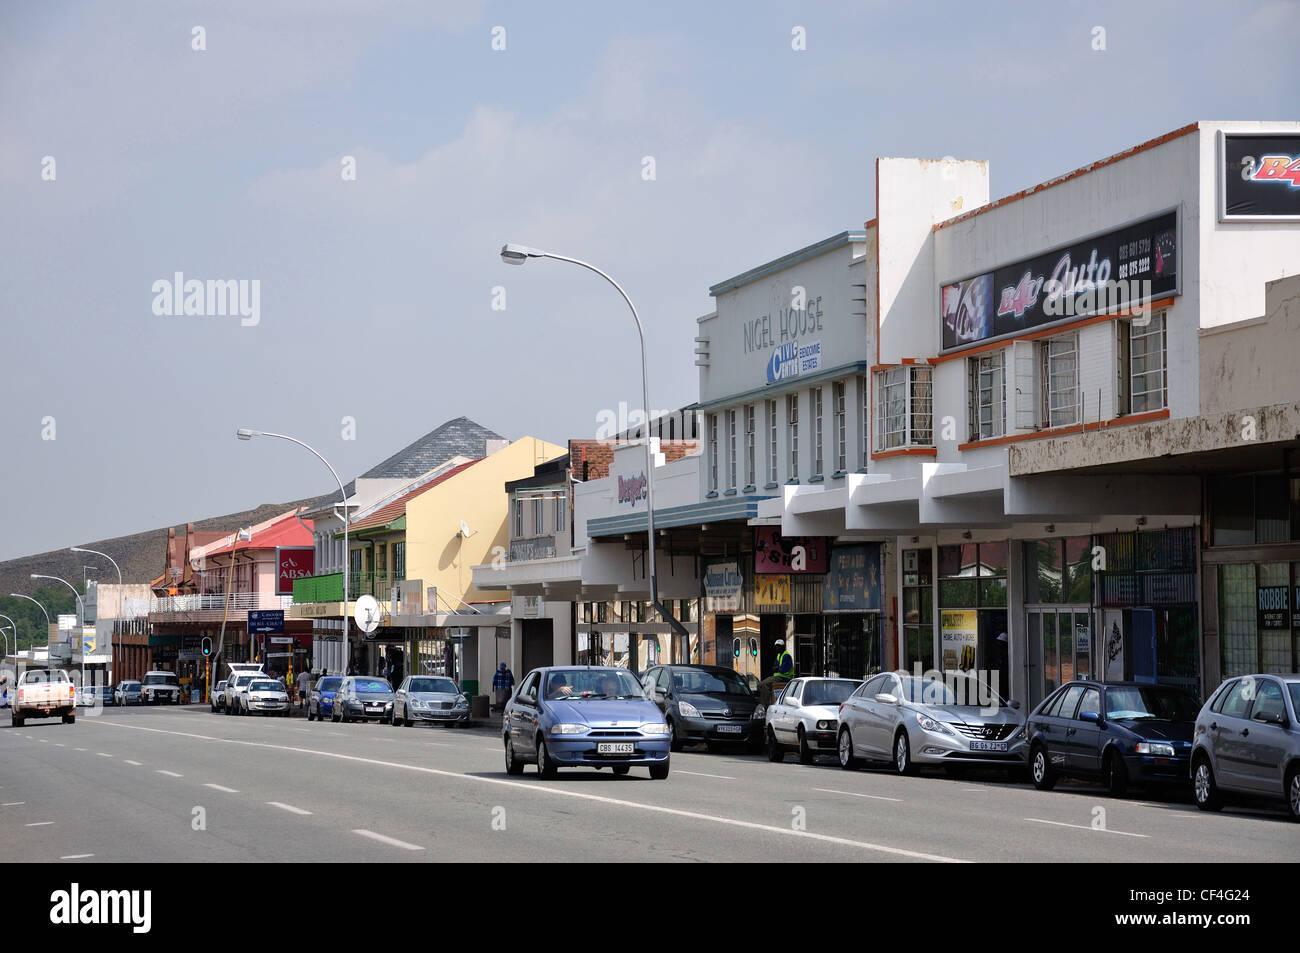 Hendrick Verwoerd Street, Nigel, Gauteng Province, Republic of South Africa - Stock Image